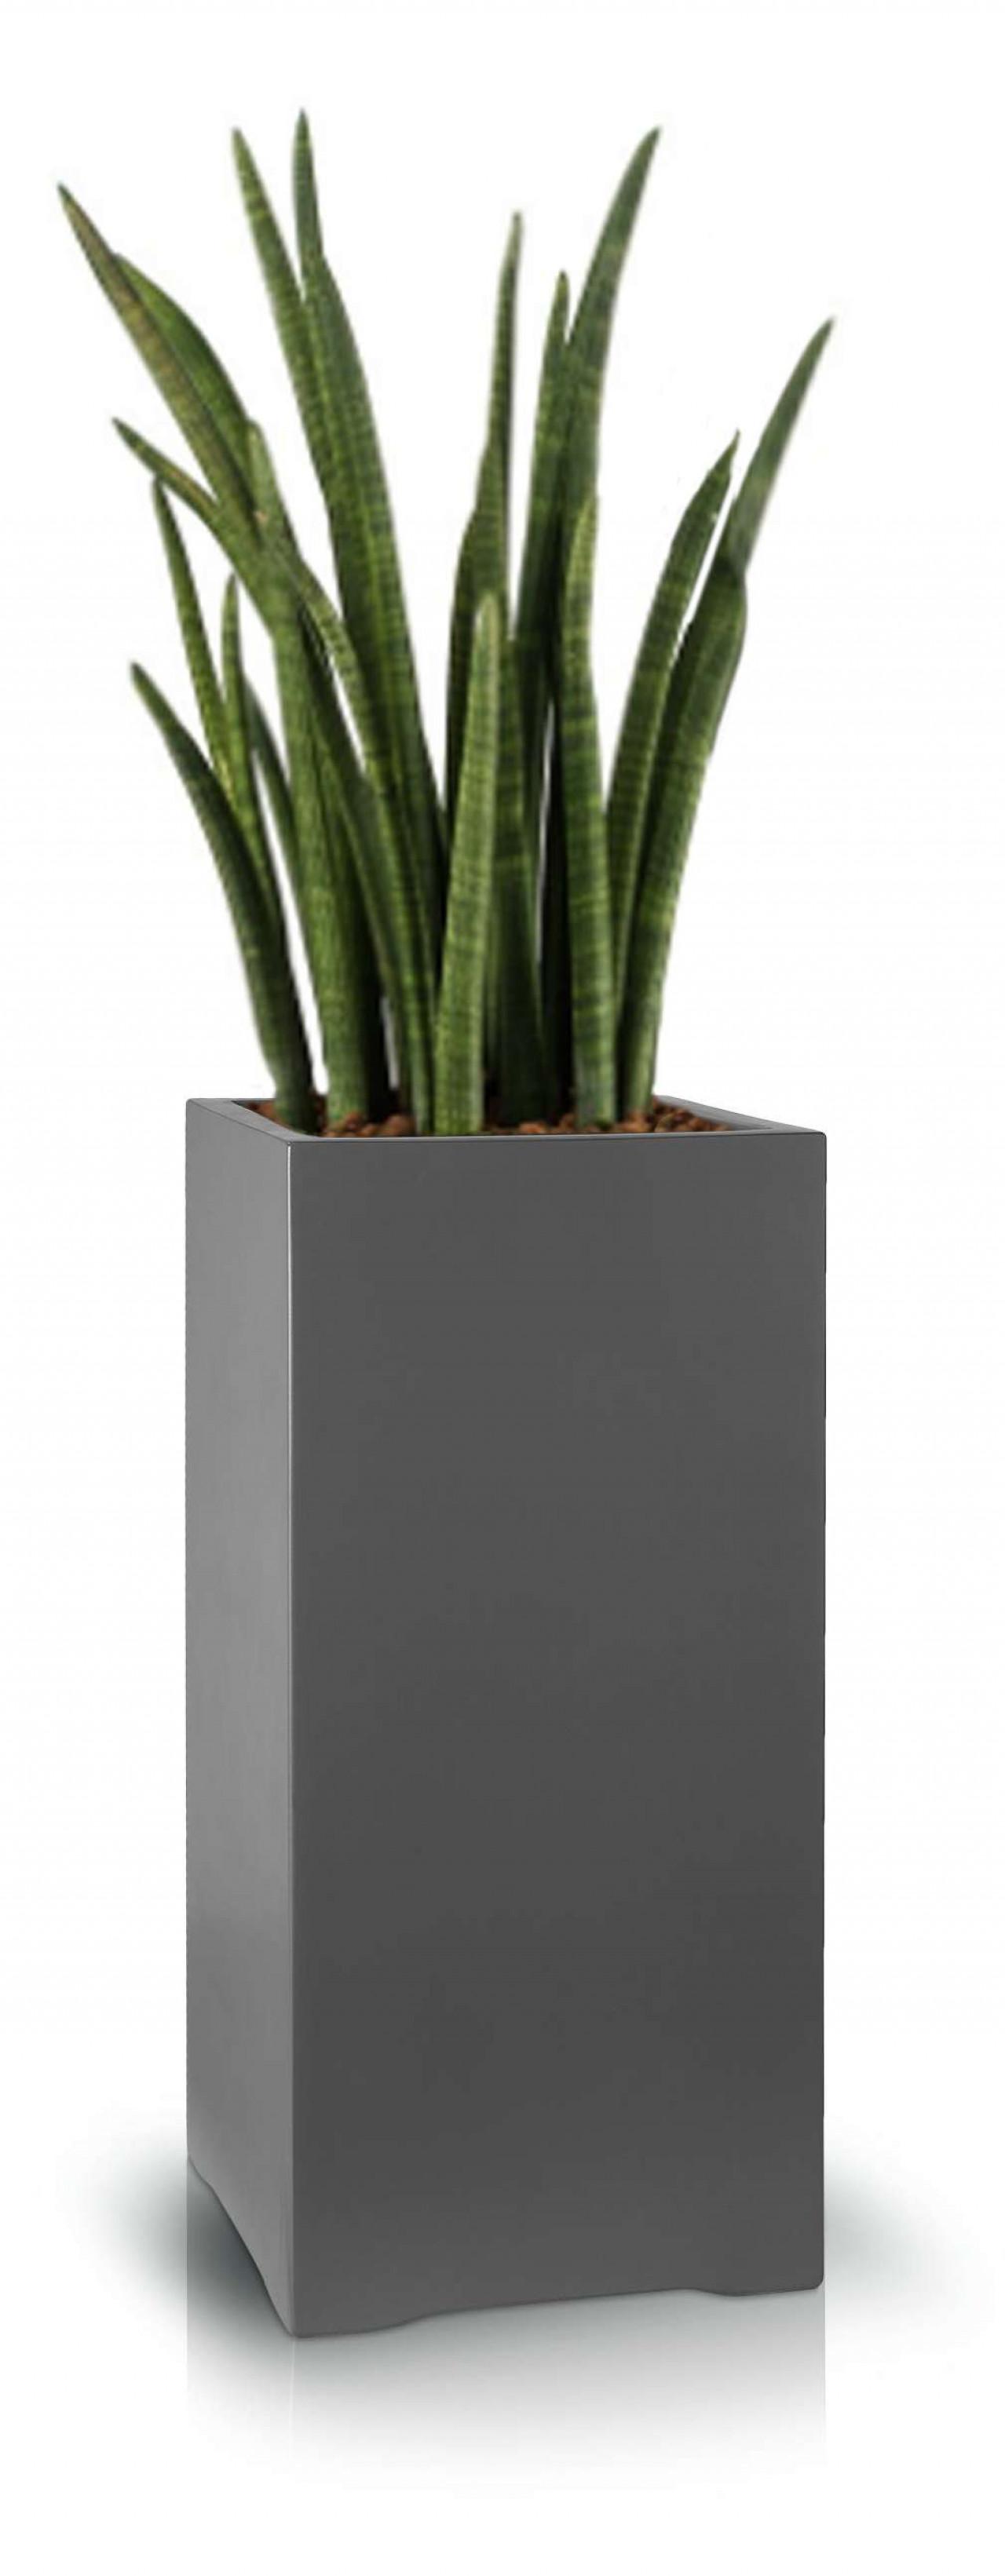 Donica Fiberglass 500 x 230 mm 95.018.50